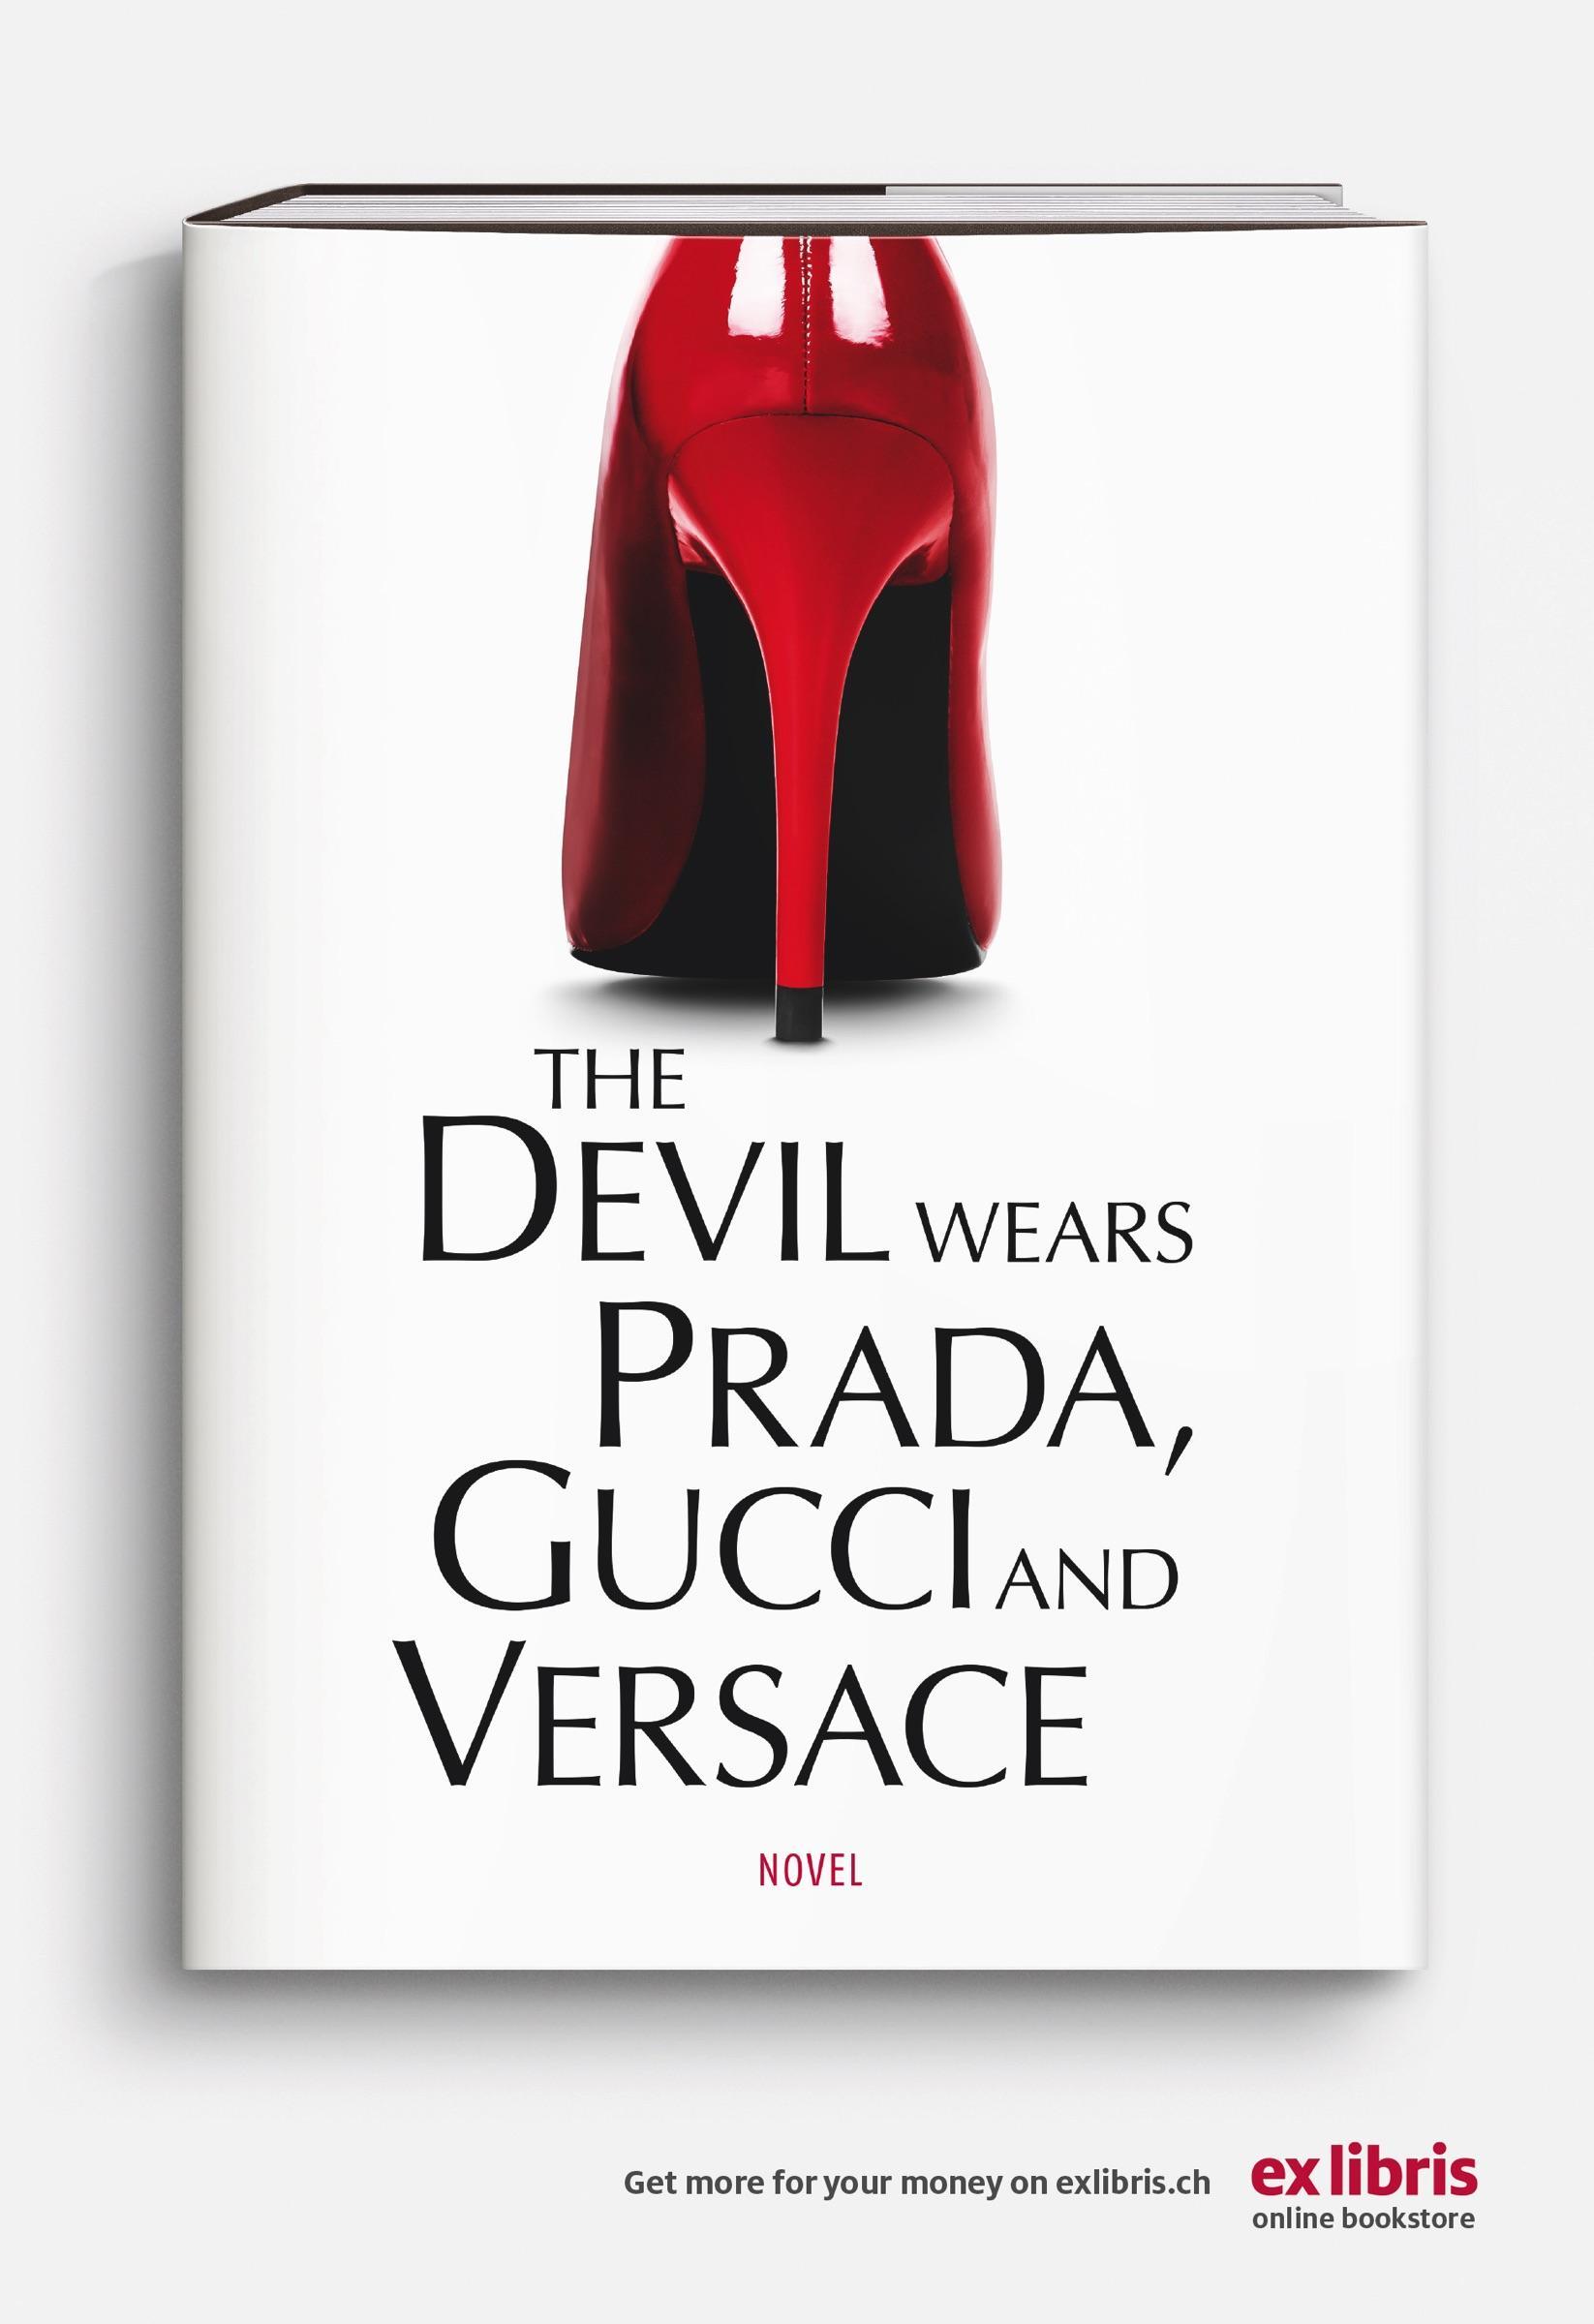 Ex Libris Print Ad - The Devil Wears Prada